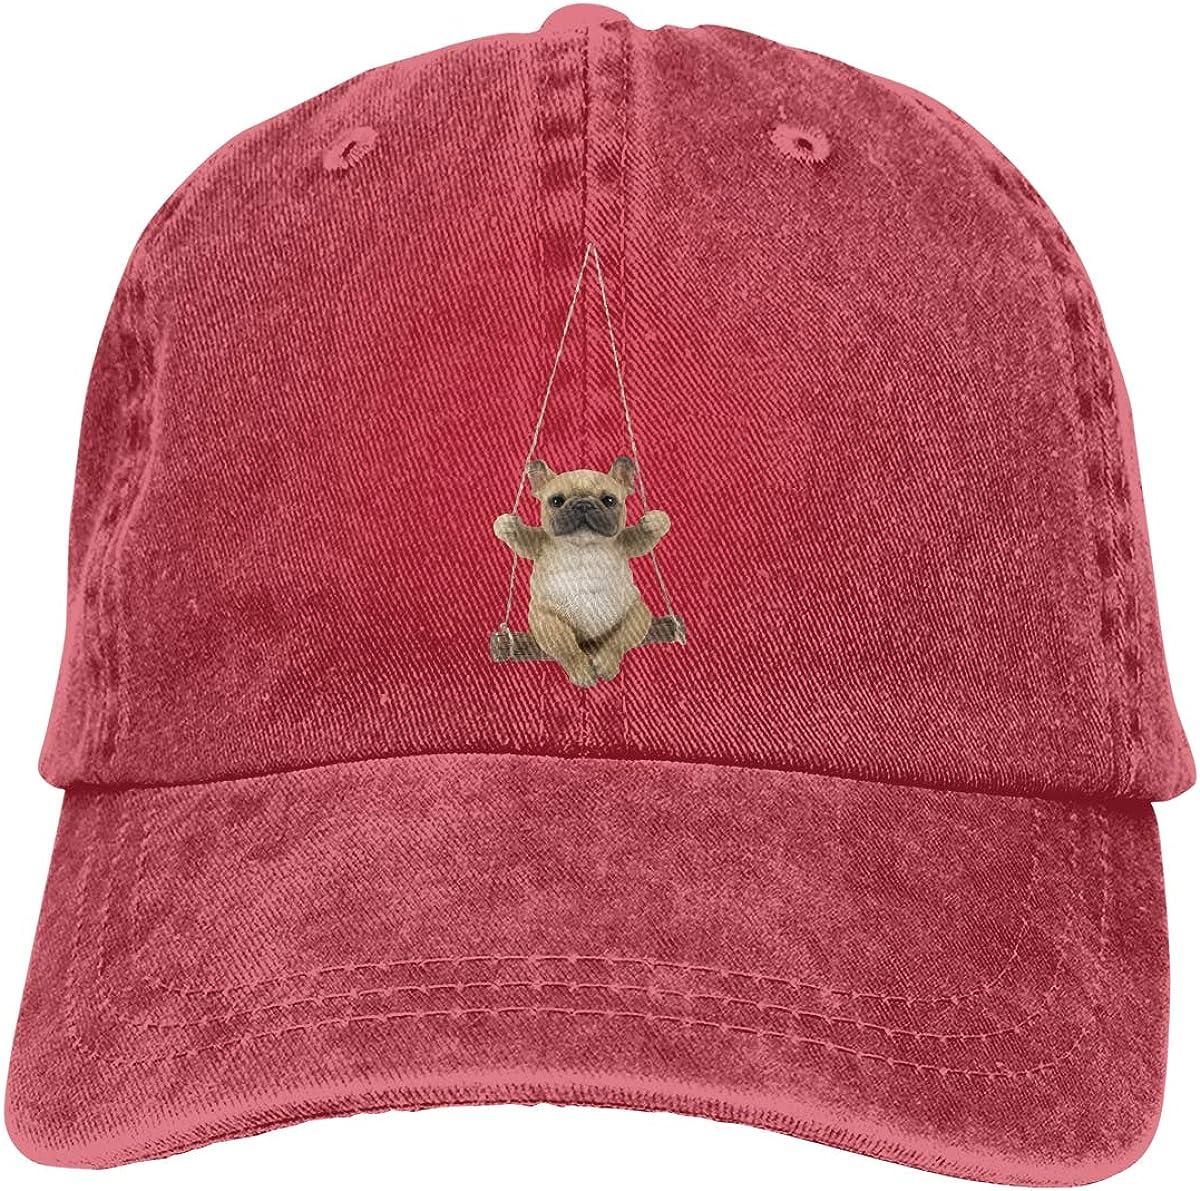 Cute Pet Unisex Custom Cowboy Hat Hip Hop Cap Adjustable Baseball Cap